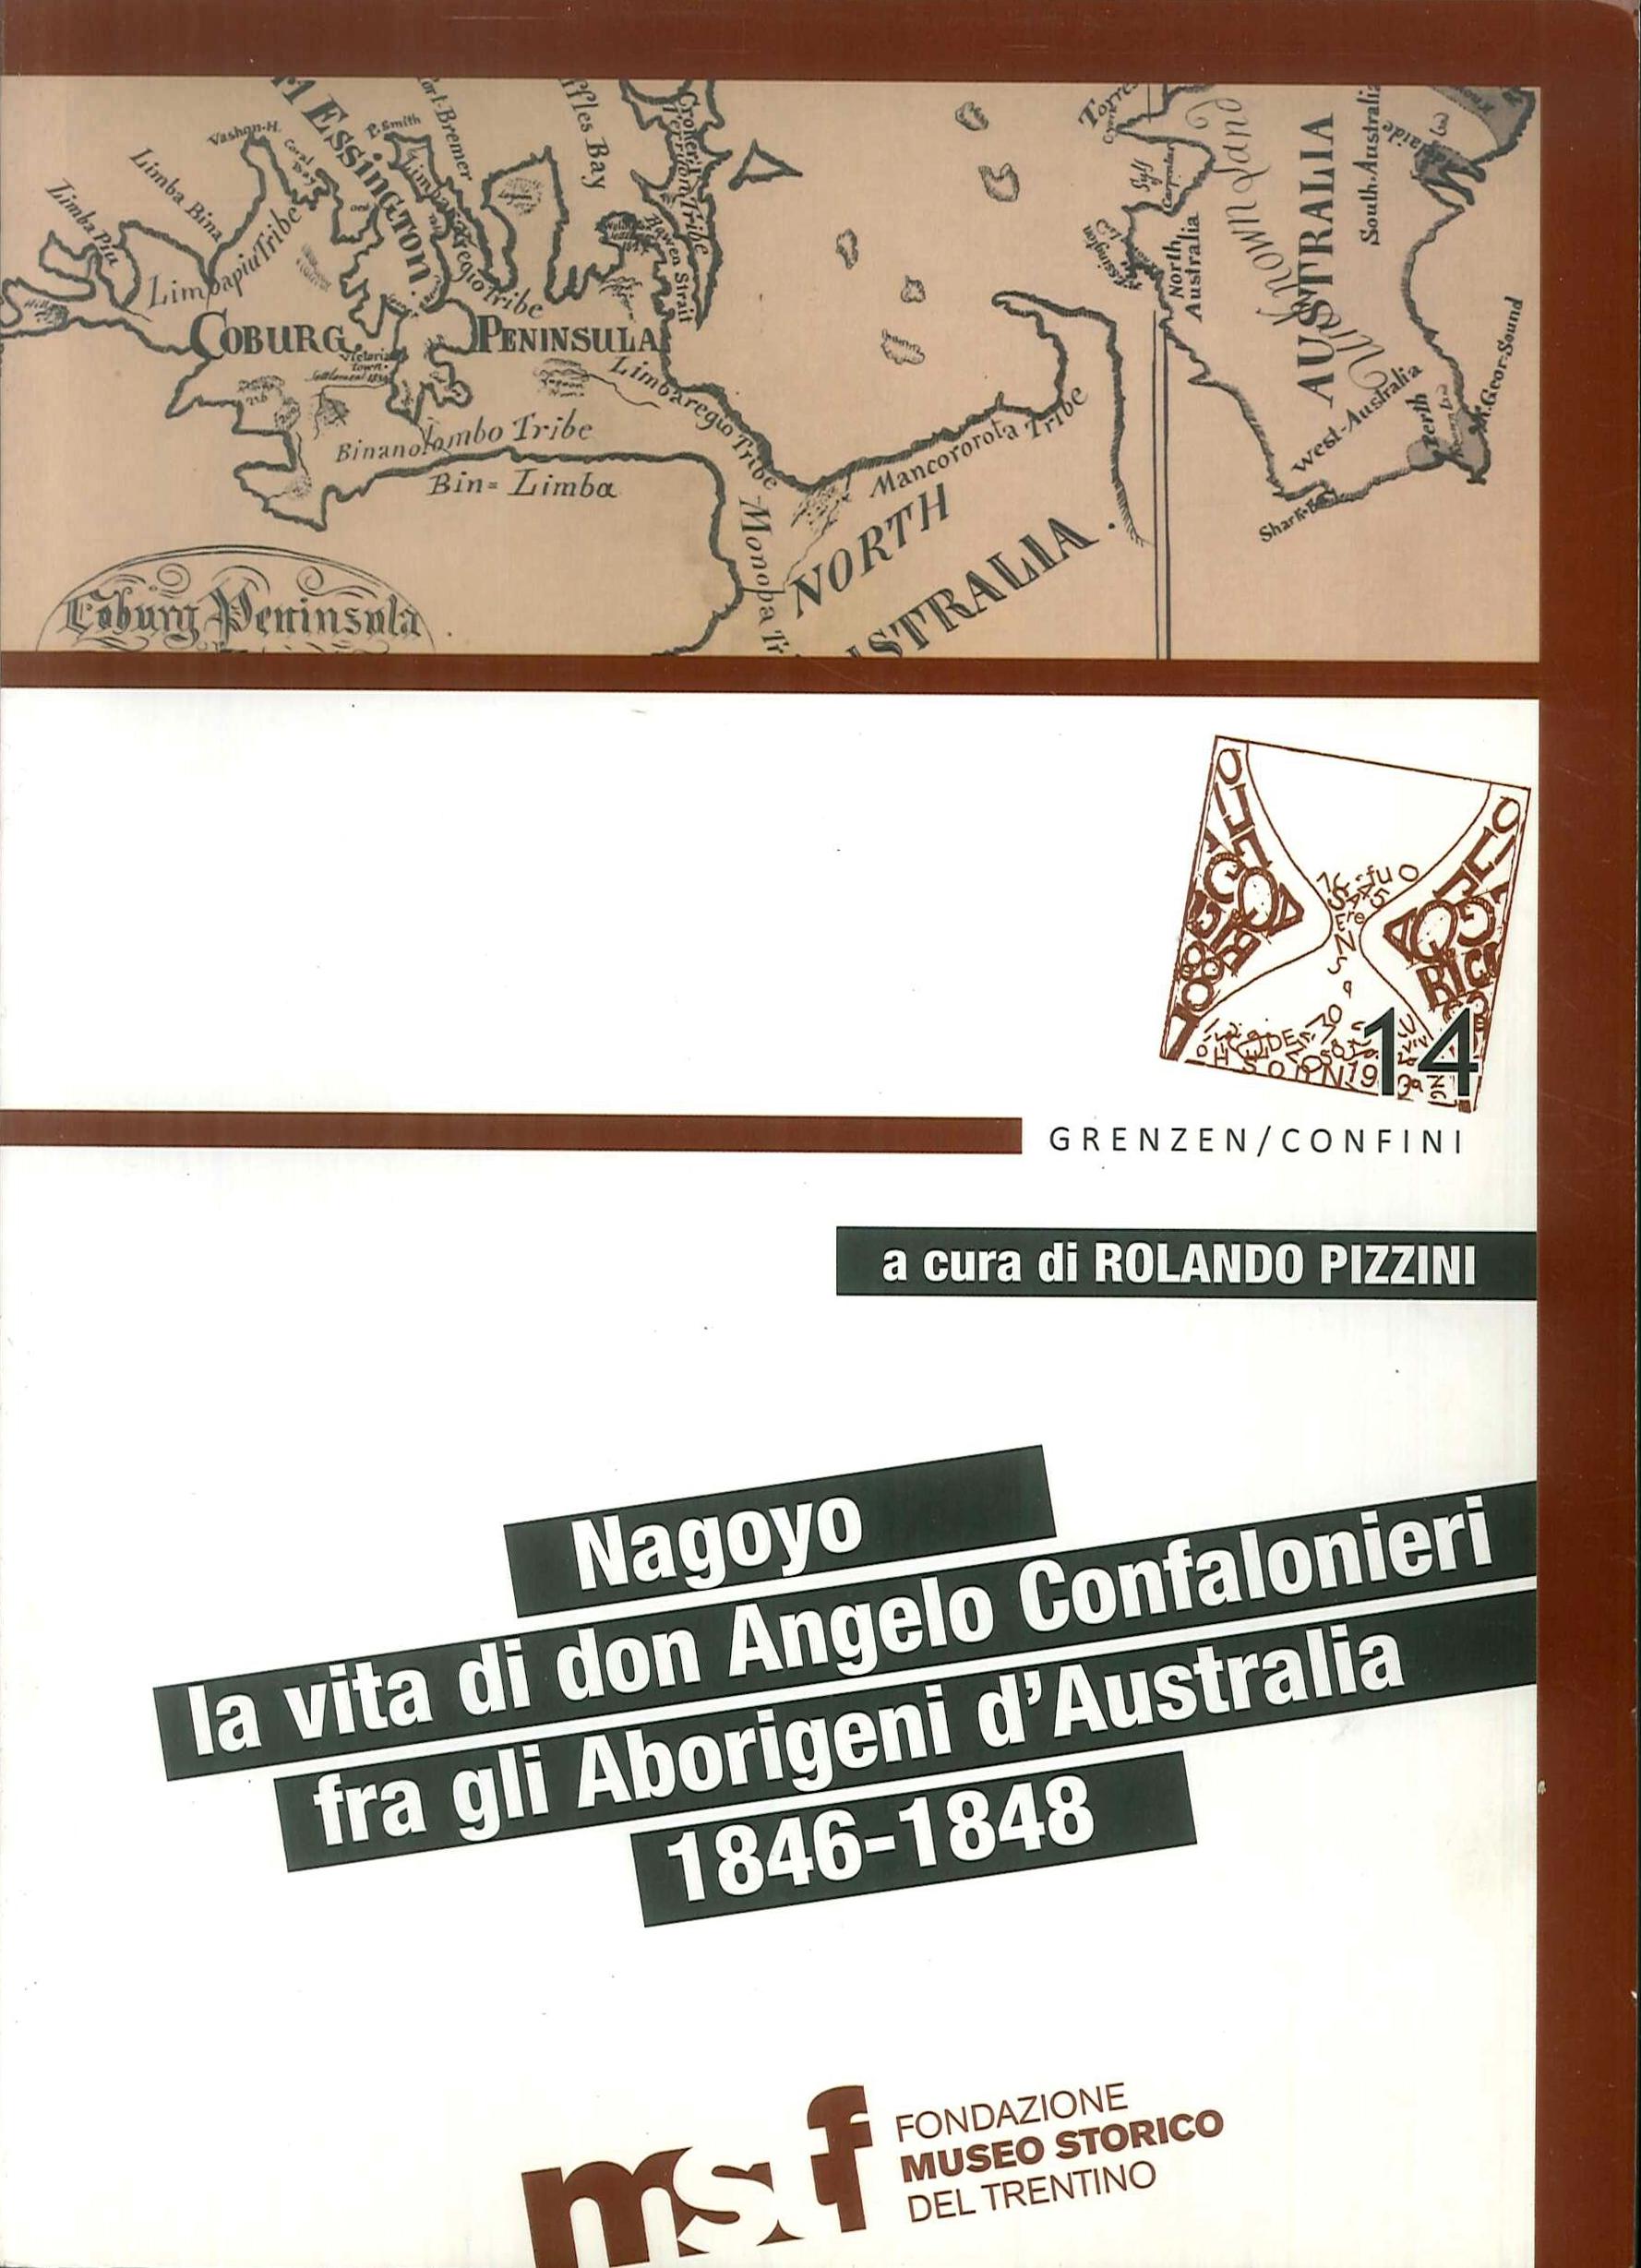 Nagoyo. La Vita Di Padre Angelo Confalonieri Fra Gli Aborigeni D'Australia.